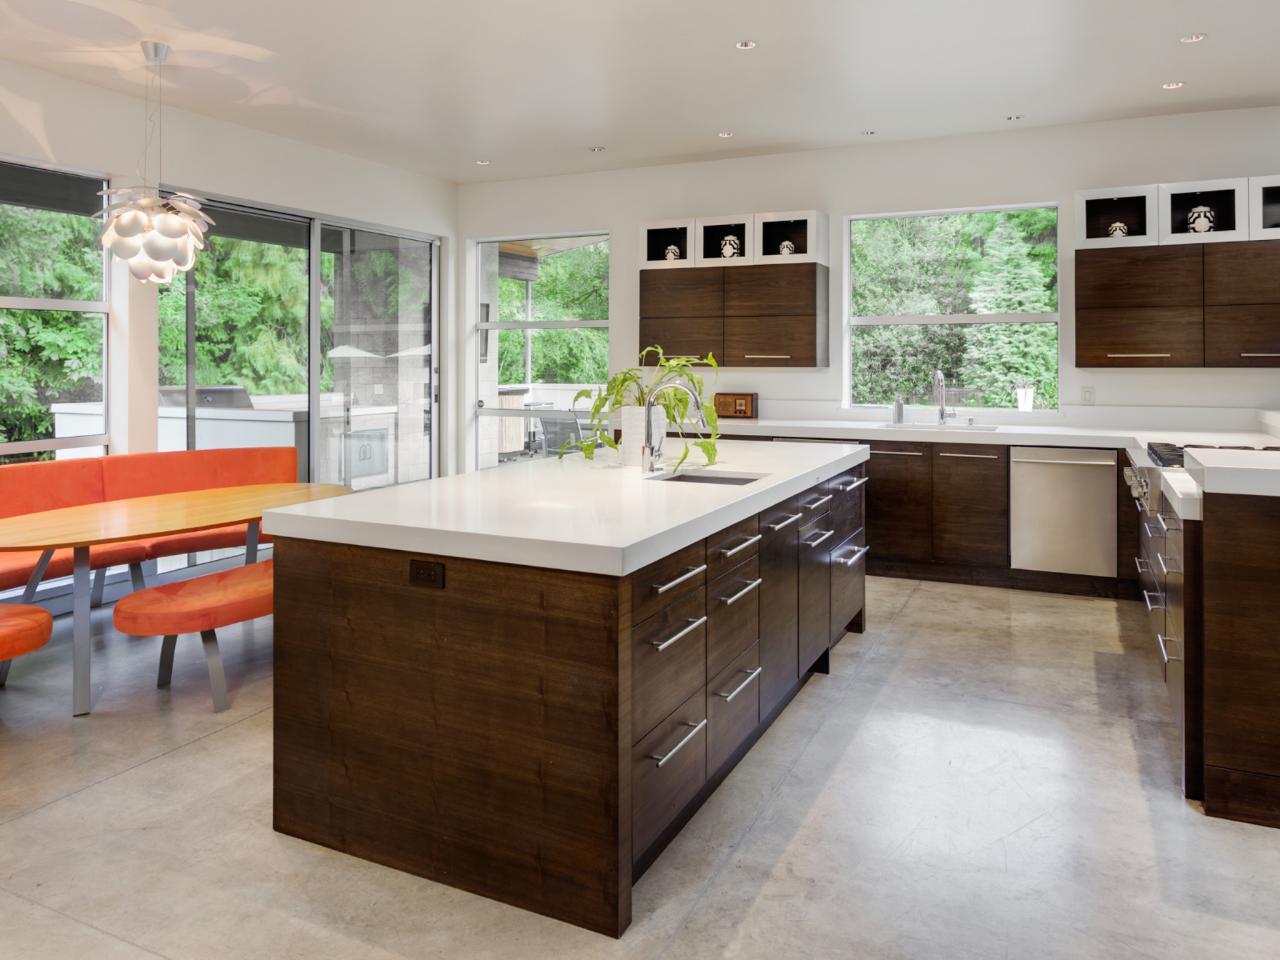 Different kitchen flooring options